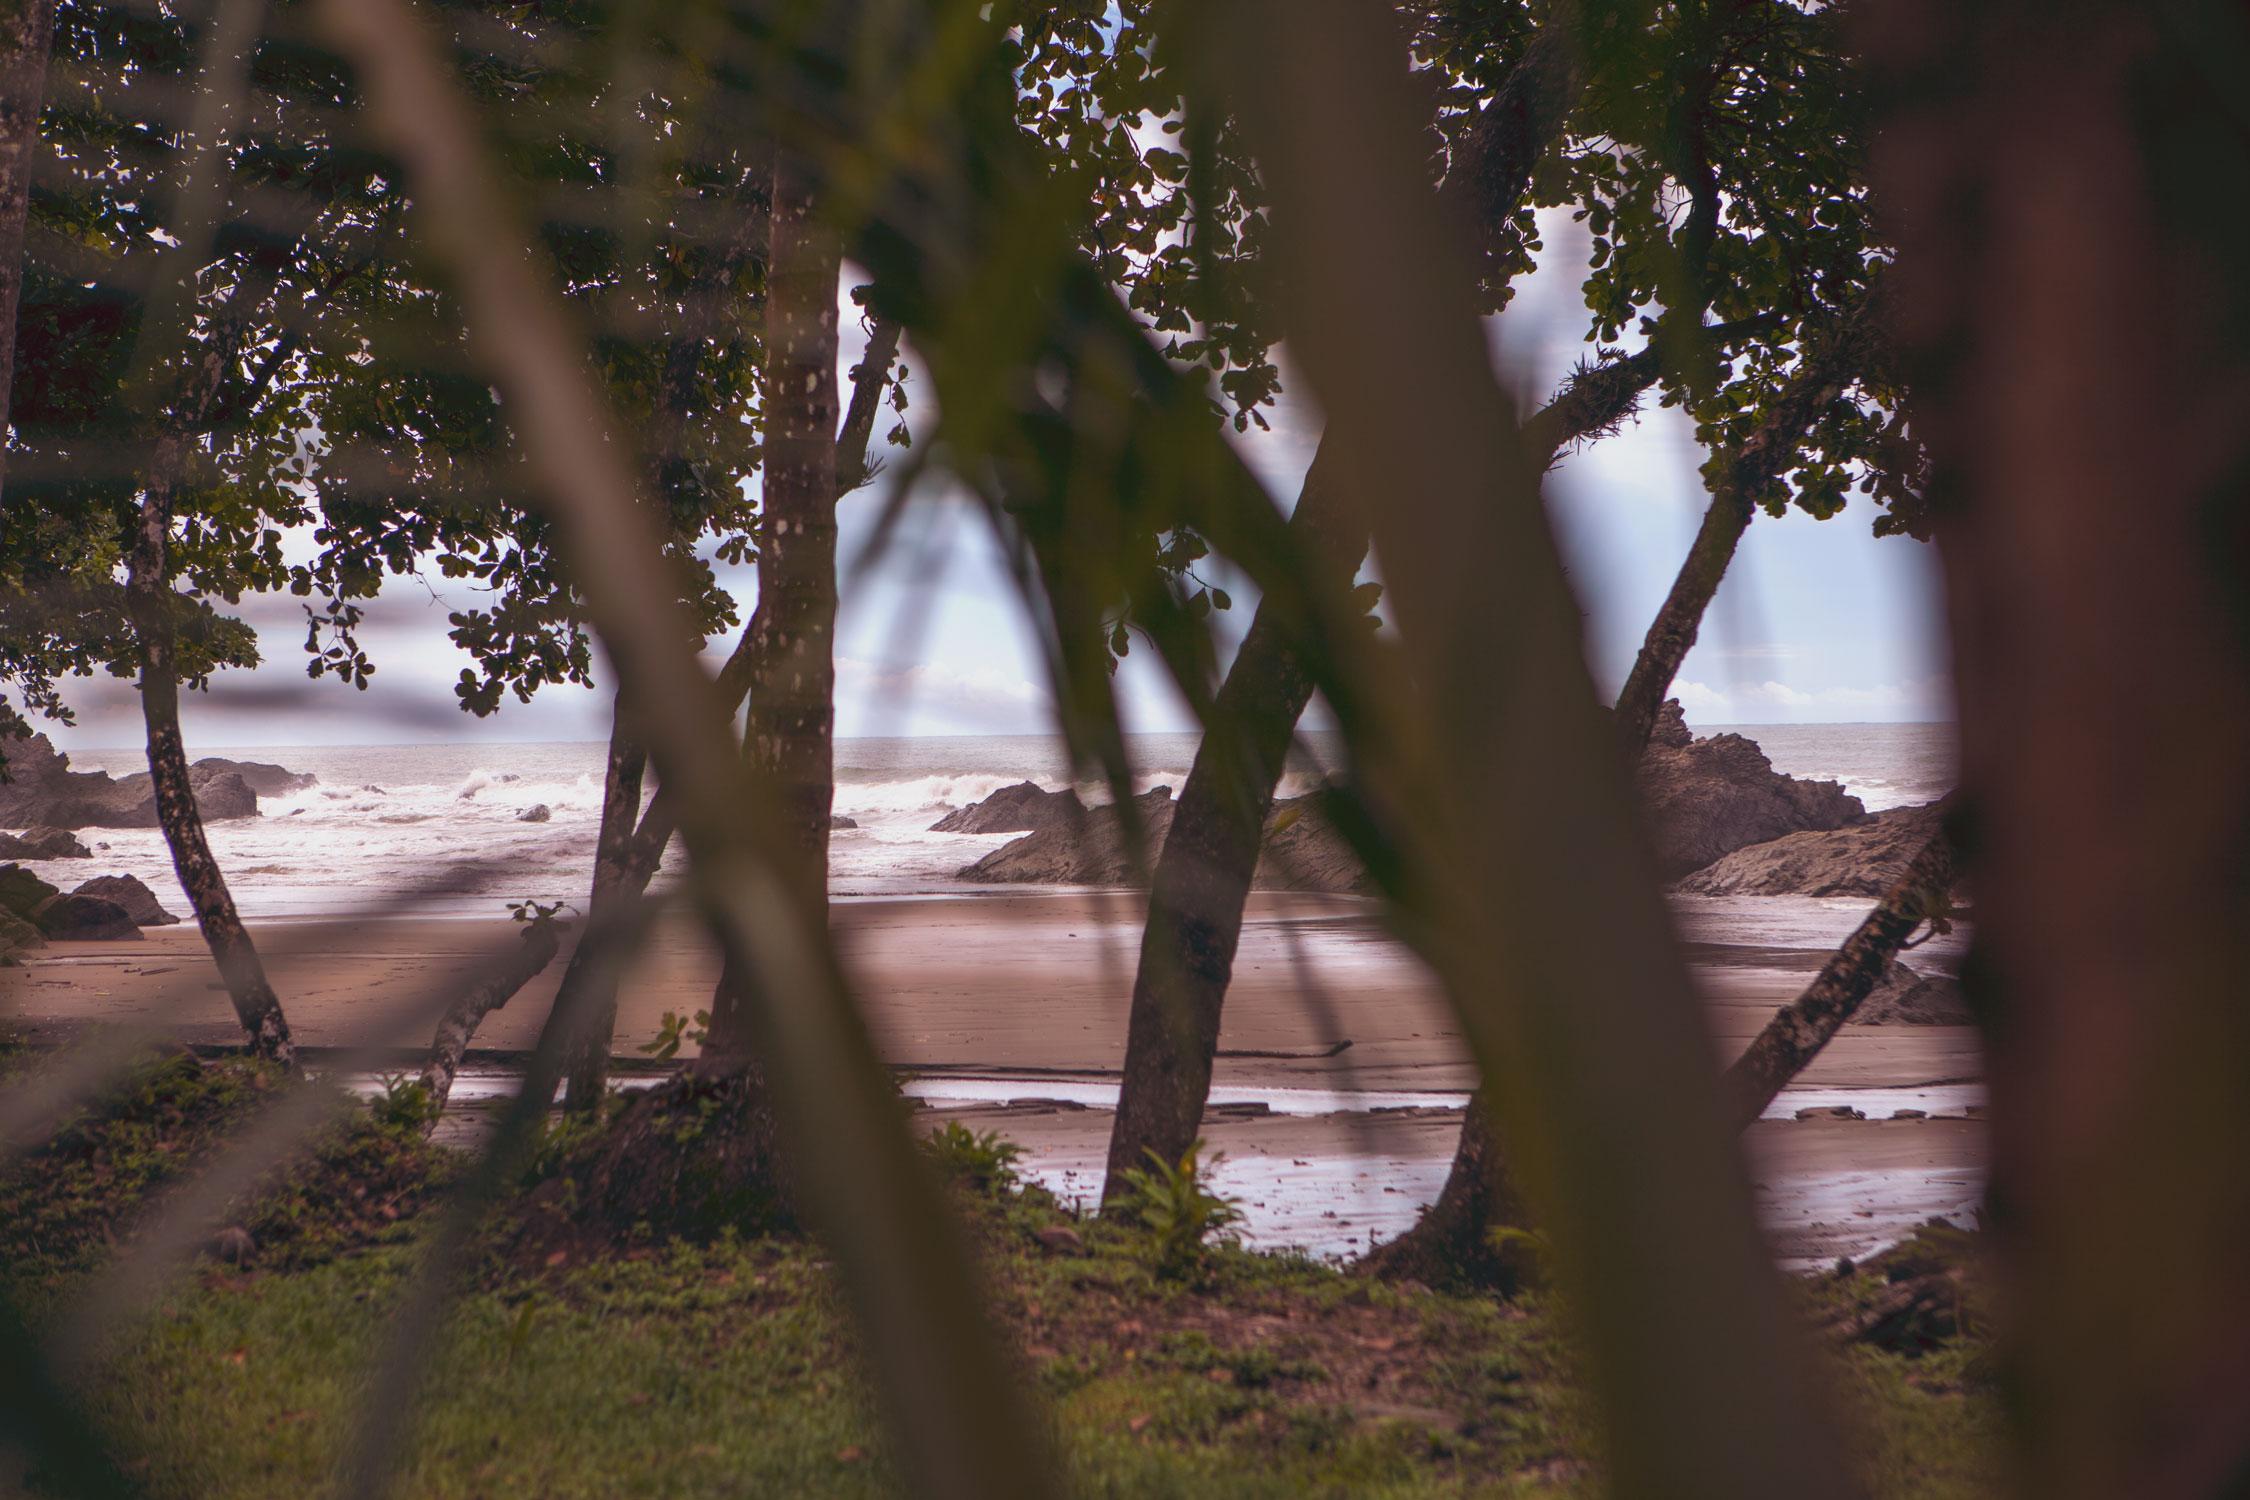 dominical-costa-rica-wander-south-beach-view-1.jpg